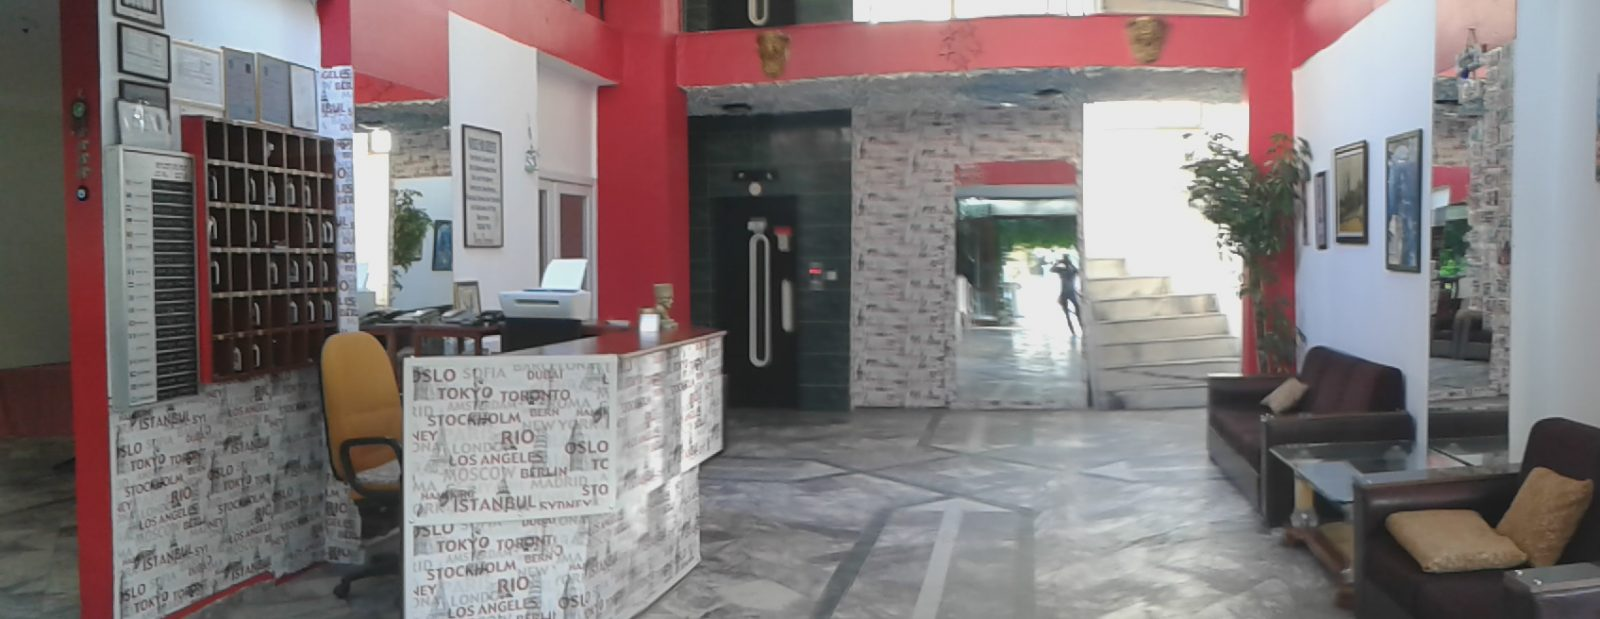 Letovanje Turska autobusom, Kusadasi, Hotel Tecimen,recepcija